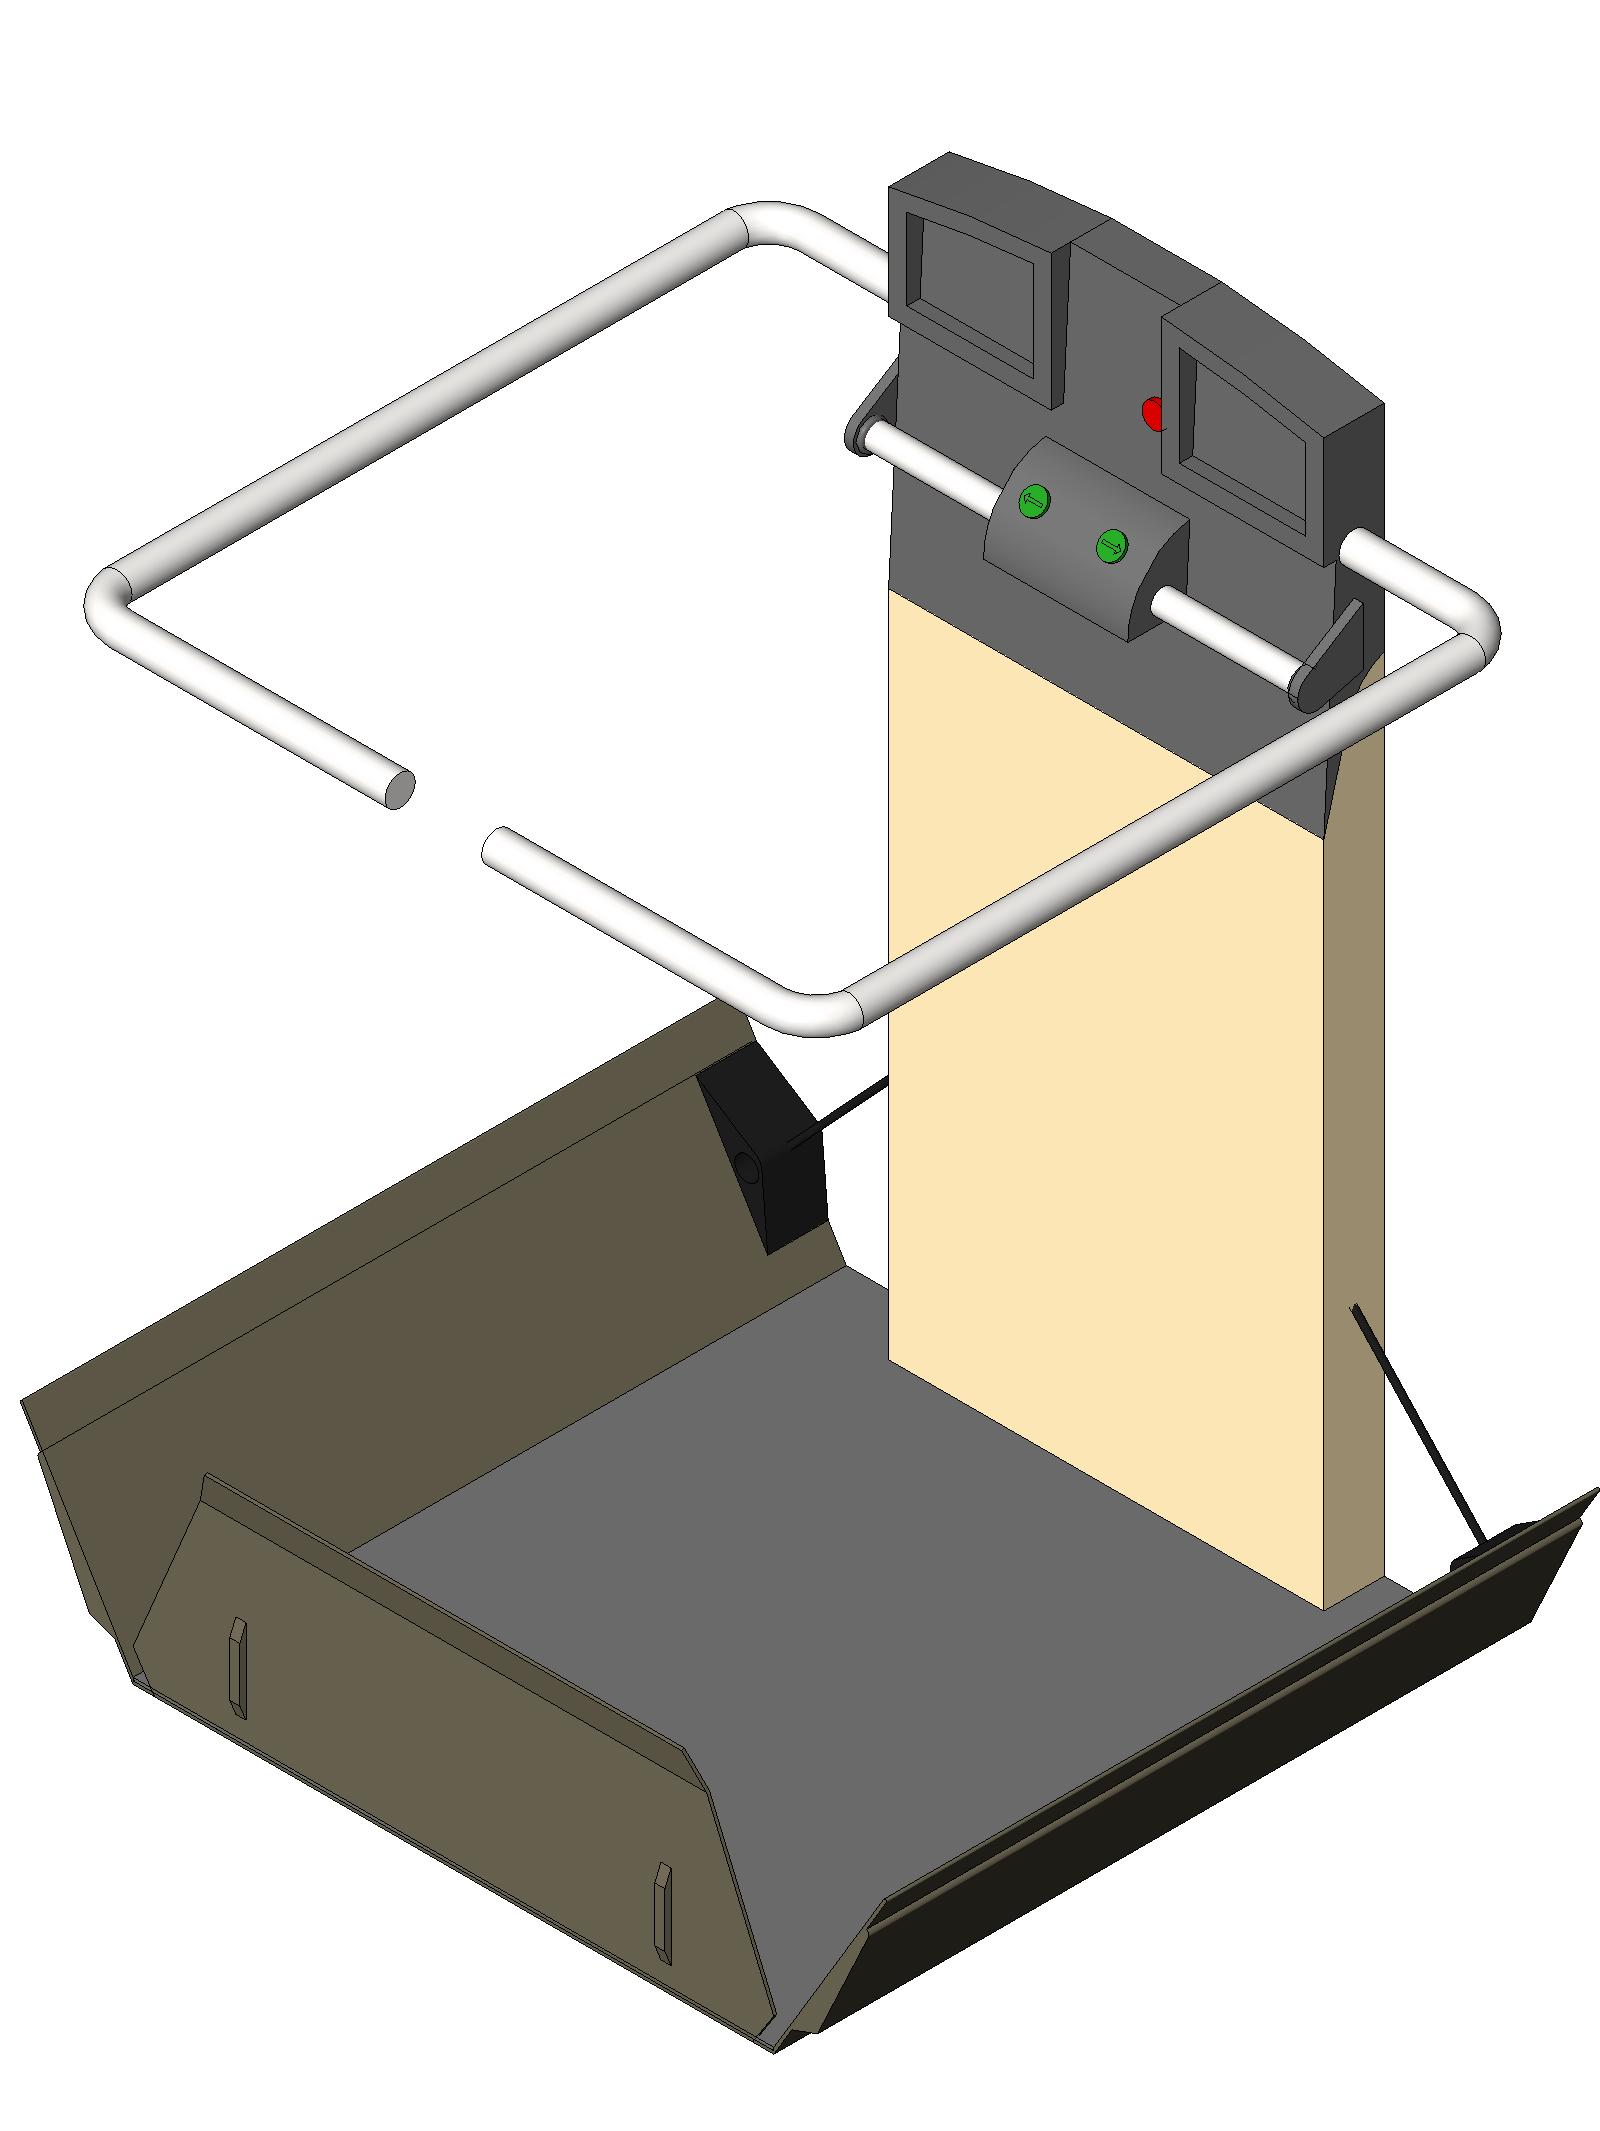 Garaventa Lift Wheelchair Lifts BIM Objects Families